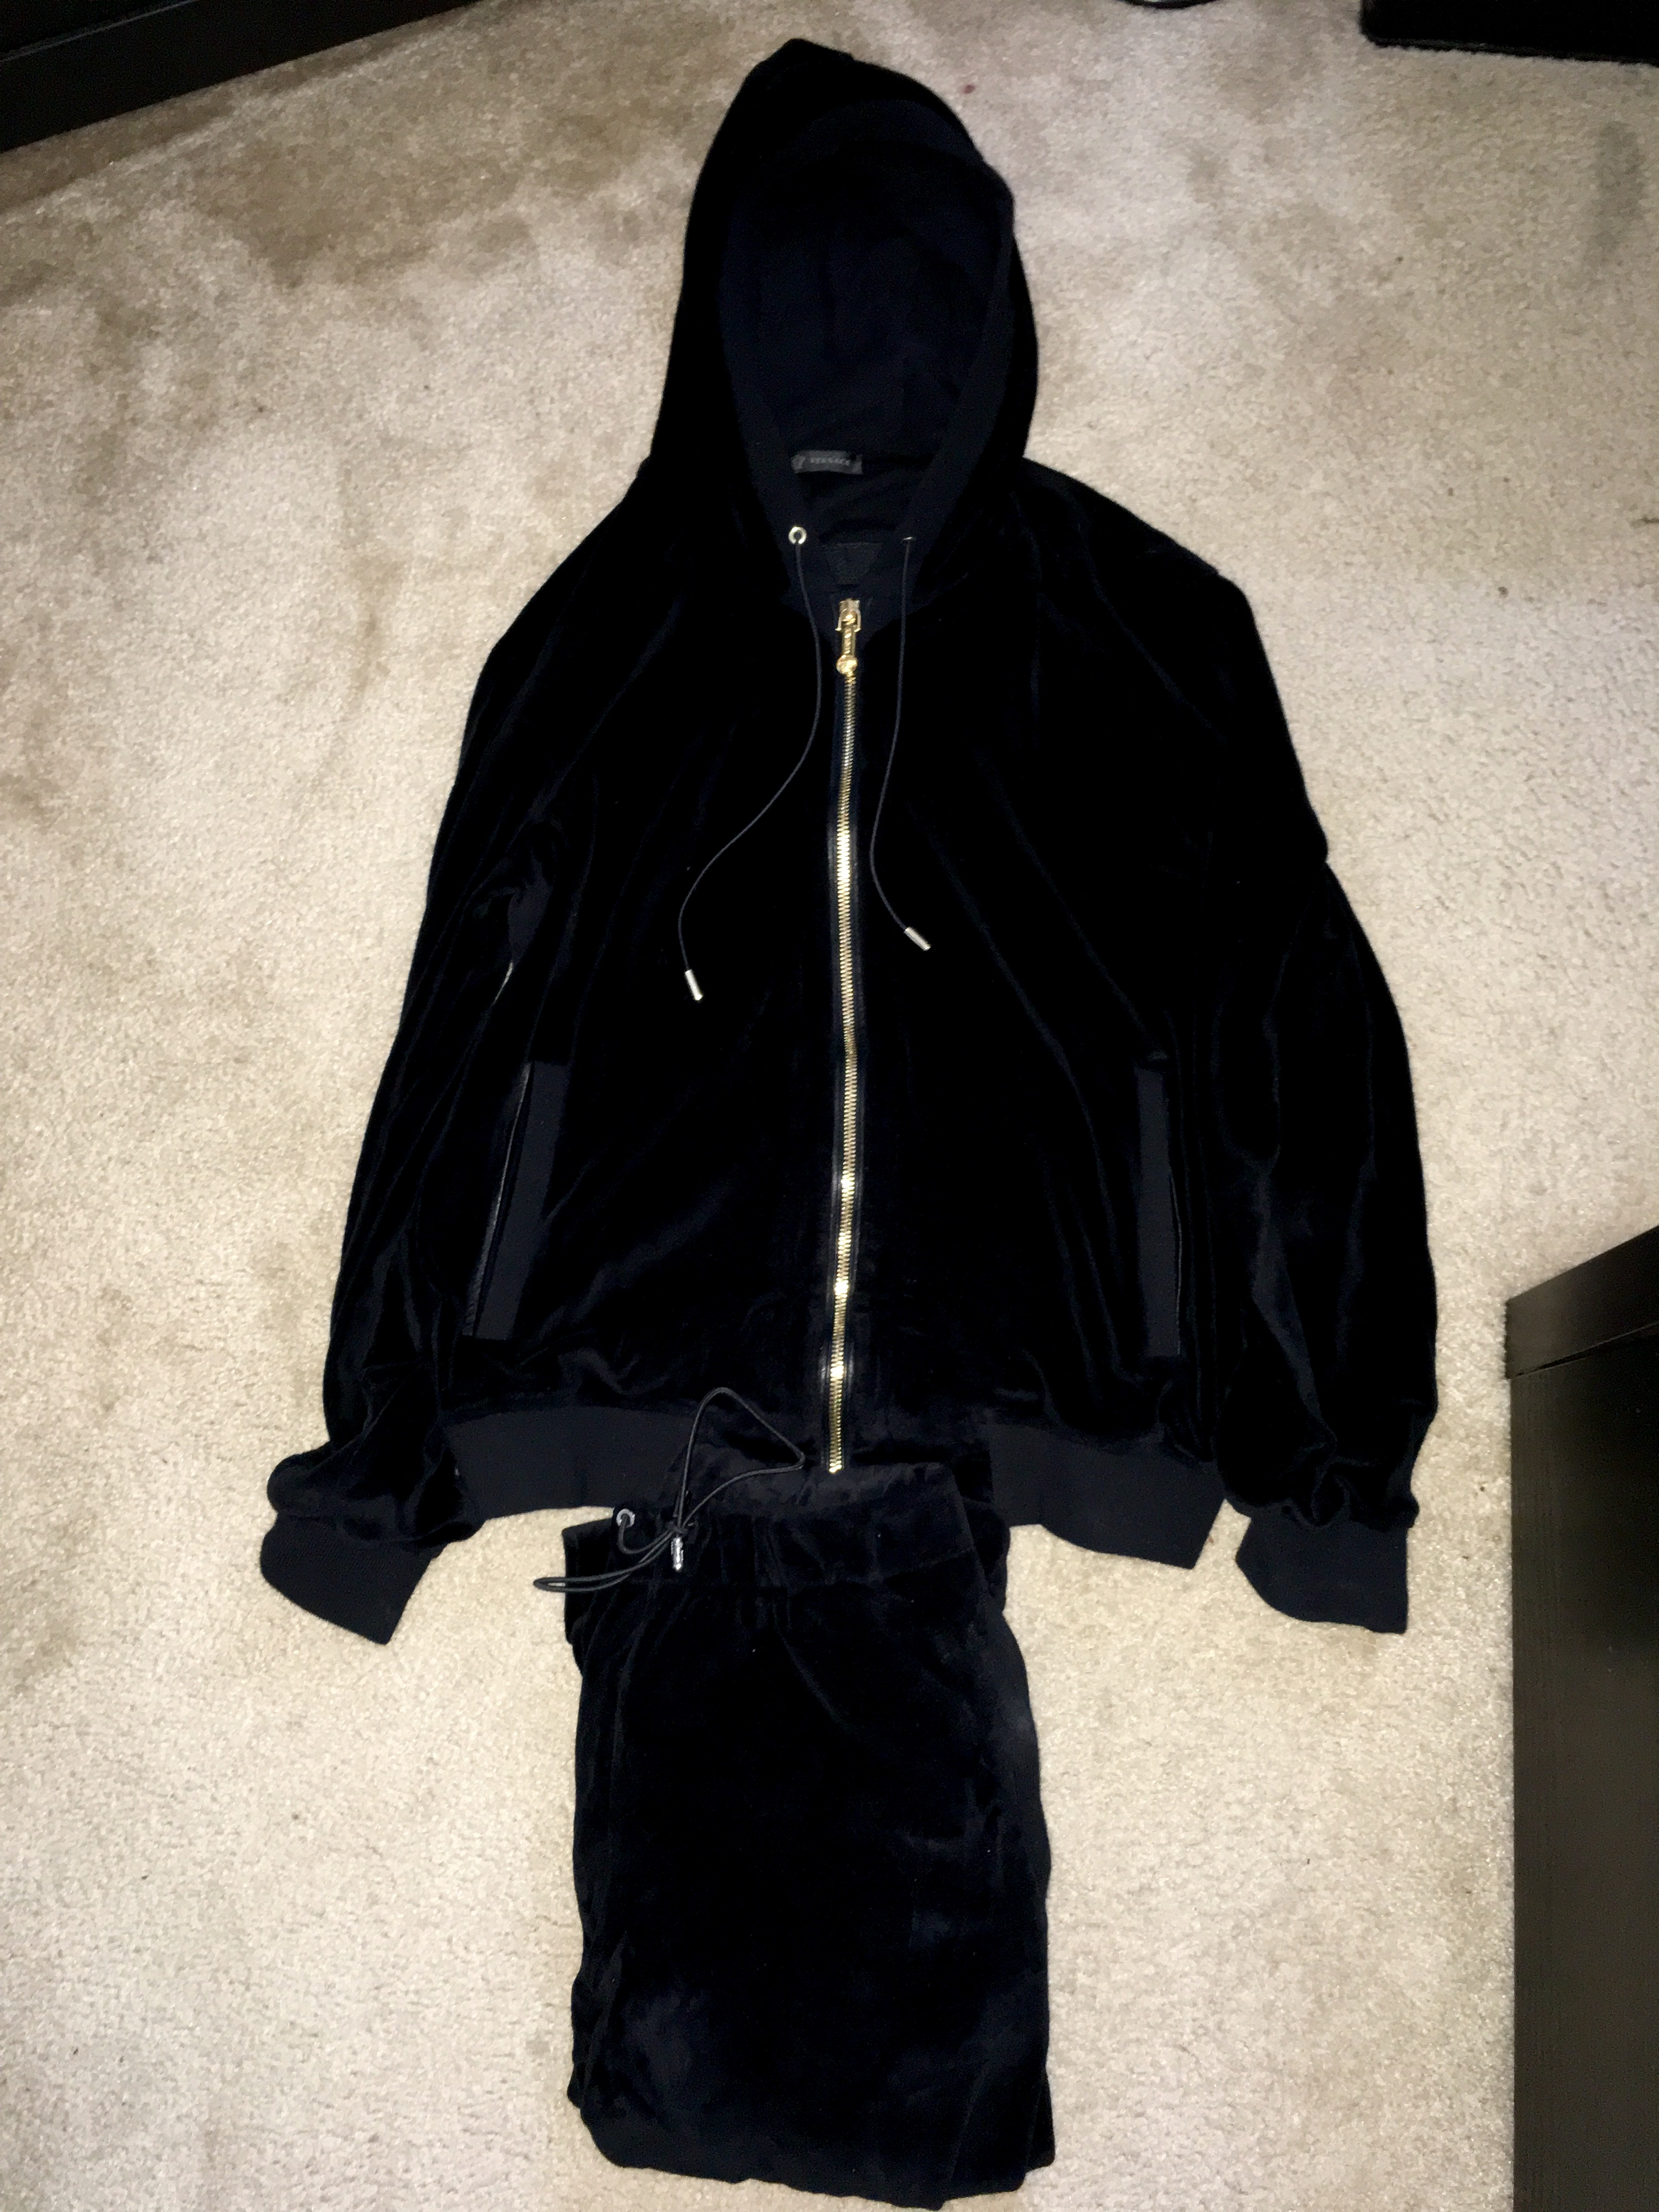 online retailer biggest discount usa cheap sale Versace velour sweatsuit